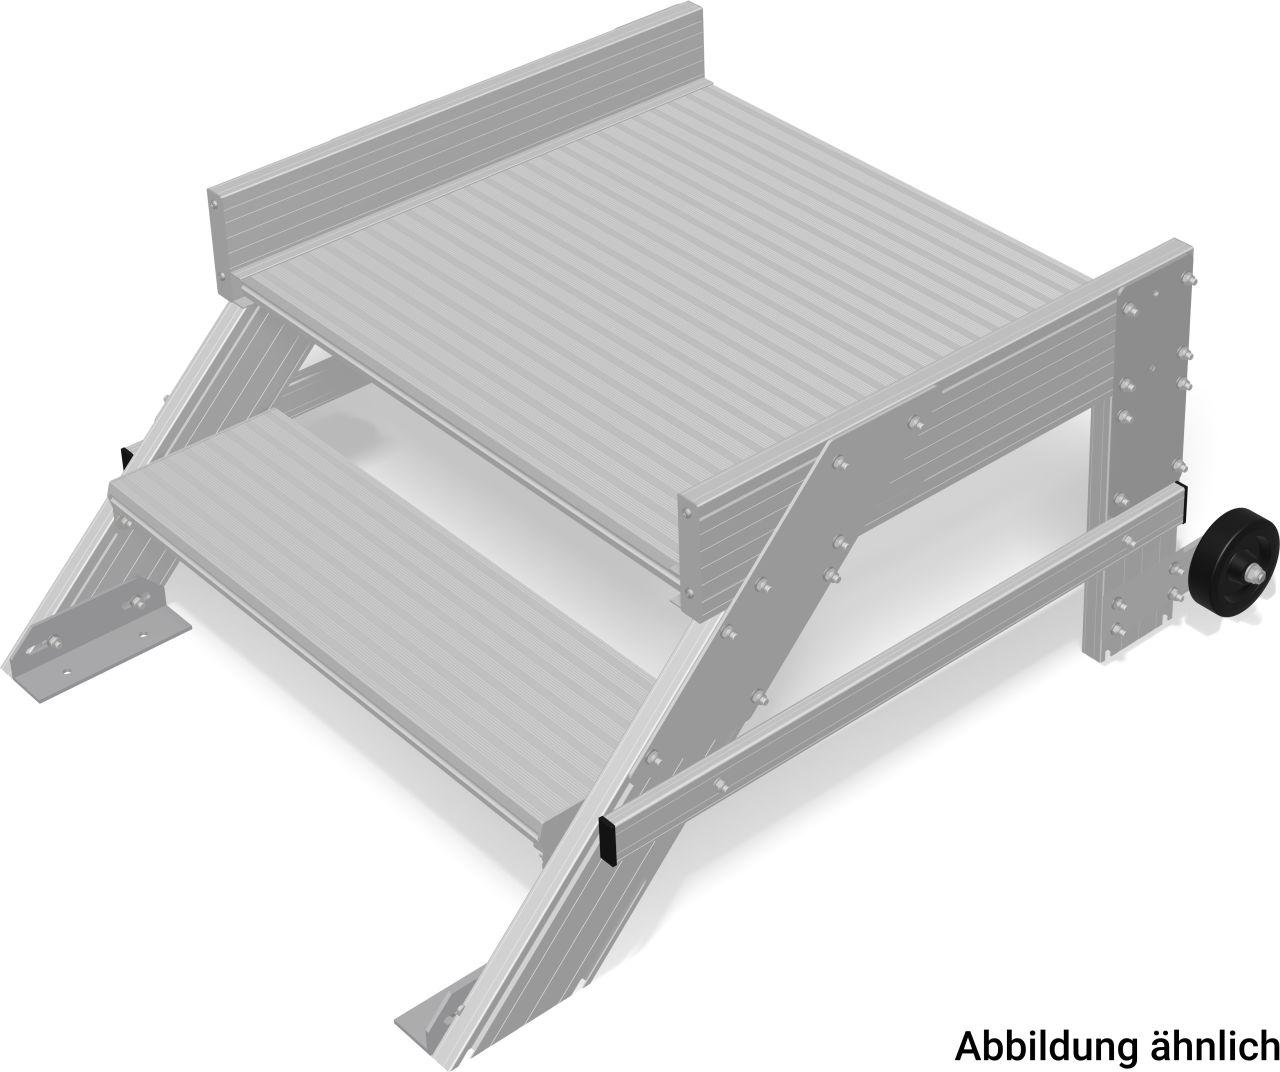 Podesttreppe, fahrbar aus Leichtmetall, Mobile Podesttreppe aus stabilen Aluminium-Profilen